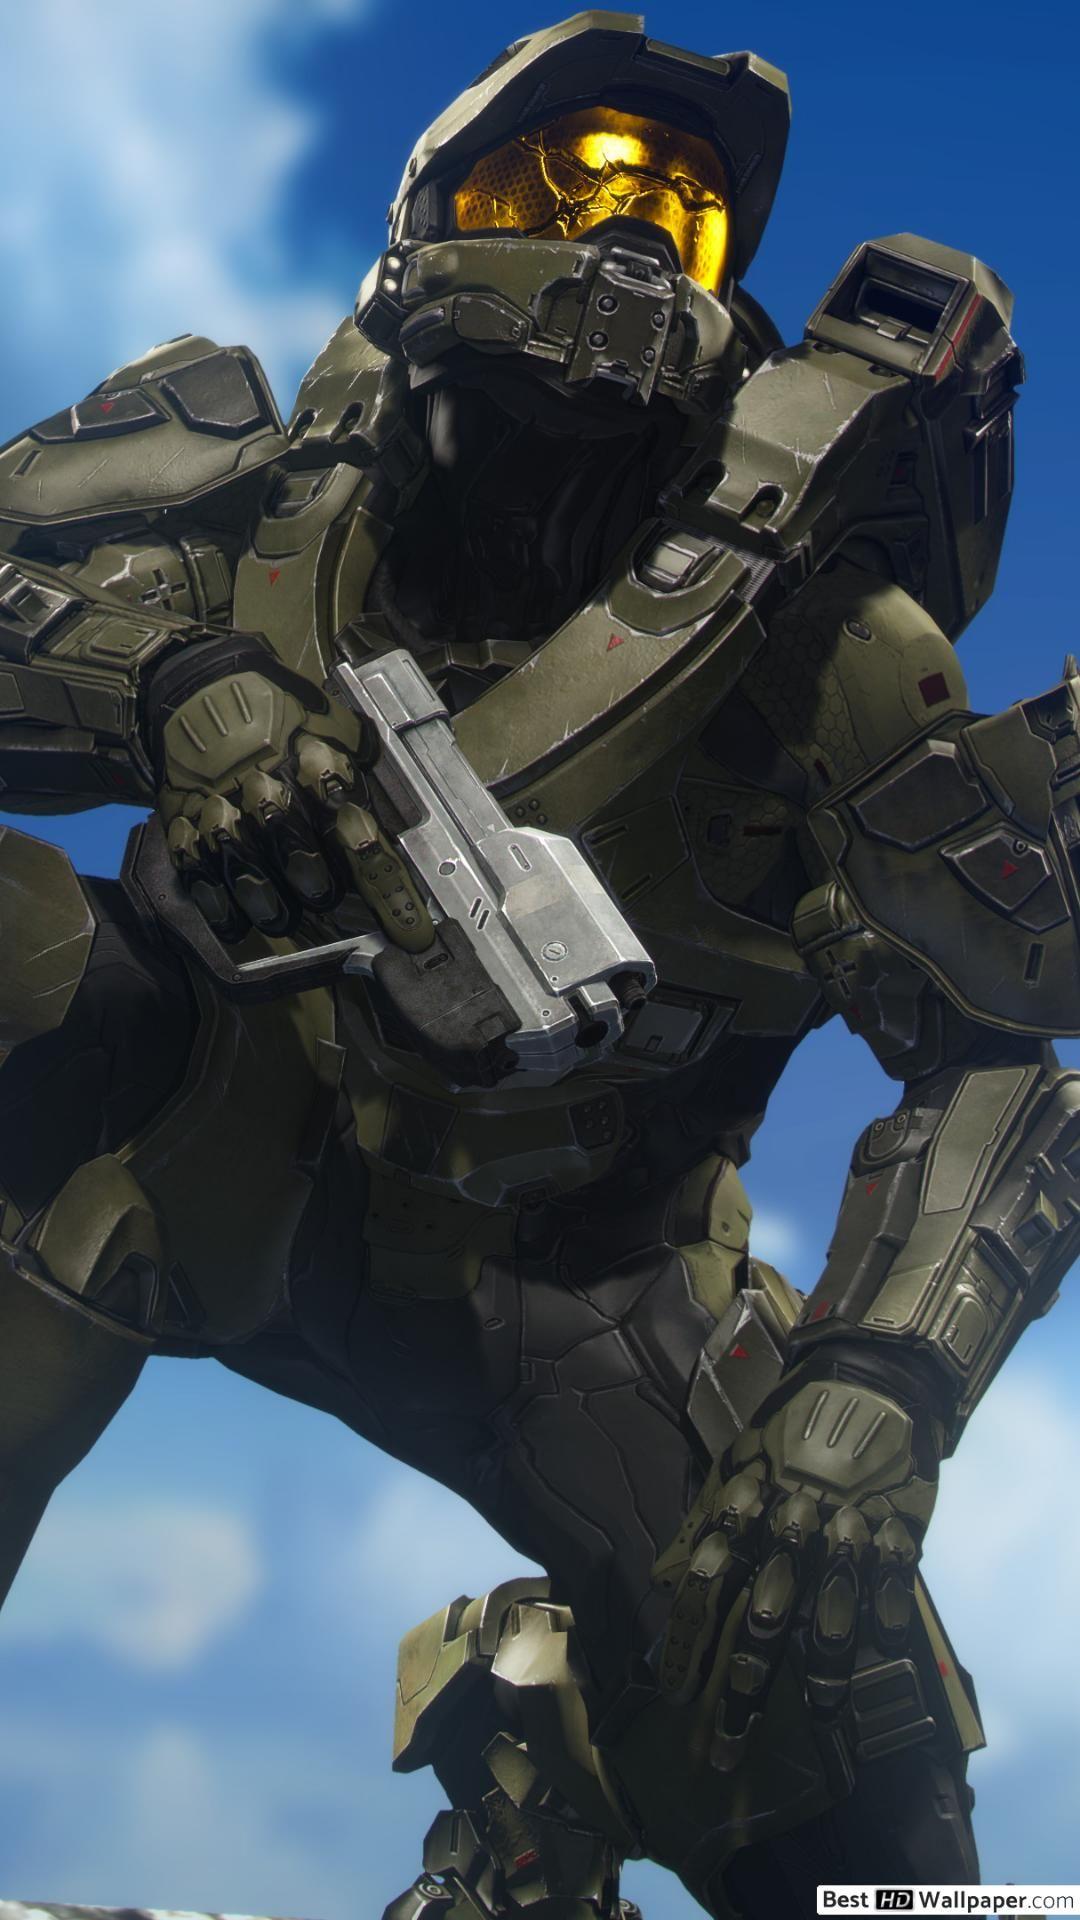 Unique Halo 4 iPhone Wallpaper